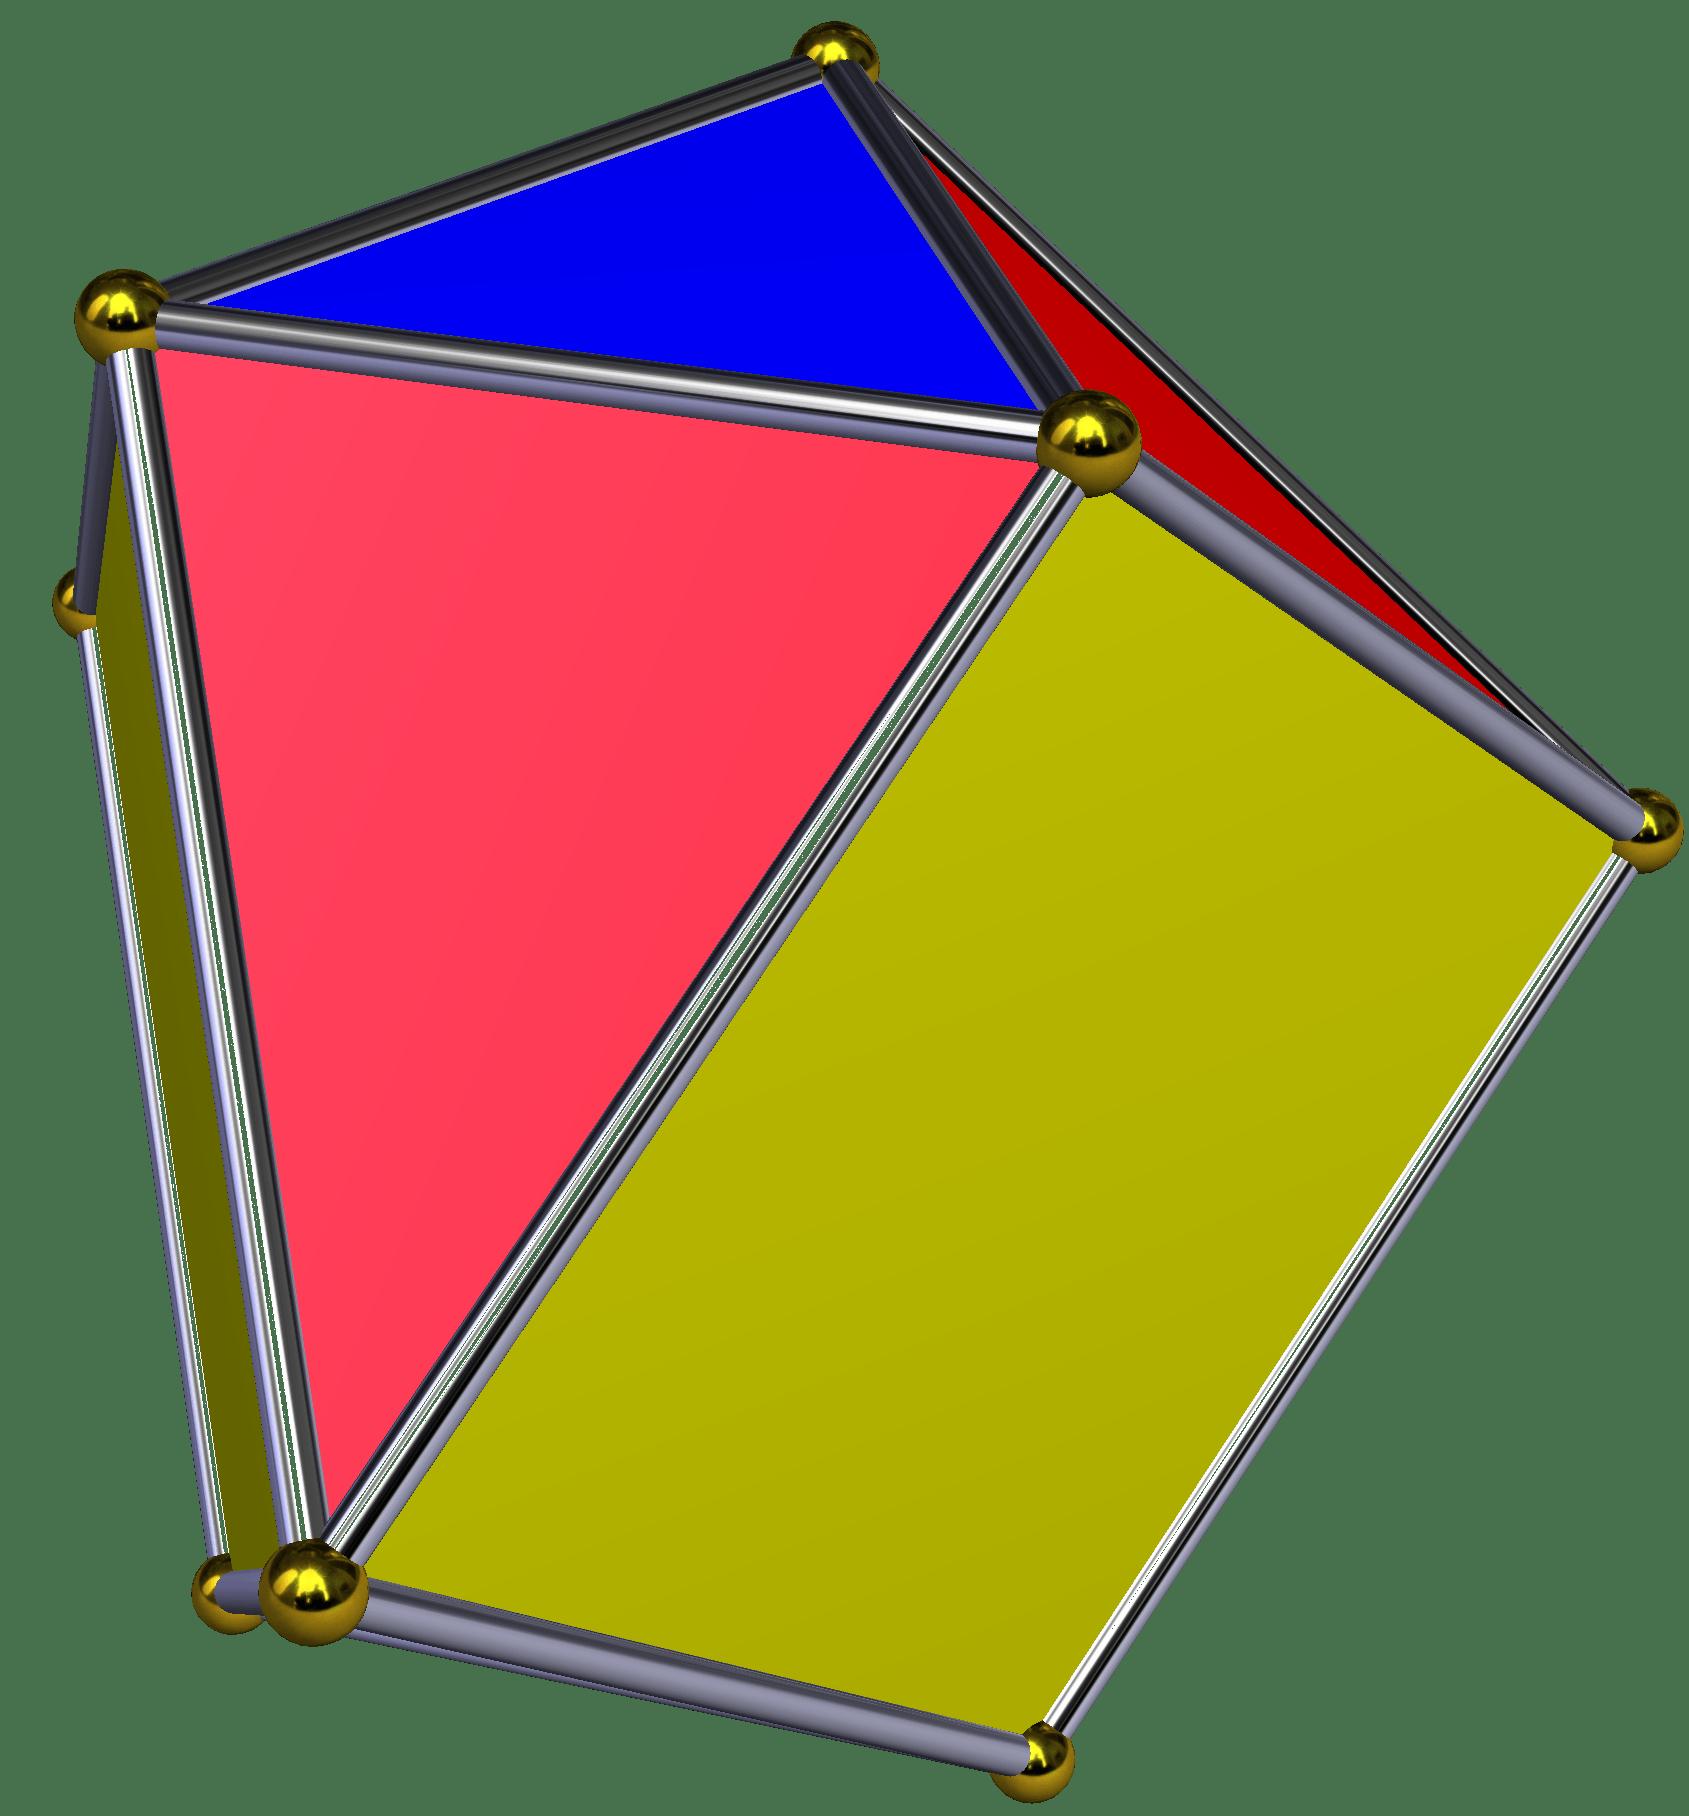 How To Draw A Triangular Prism